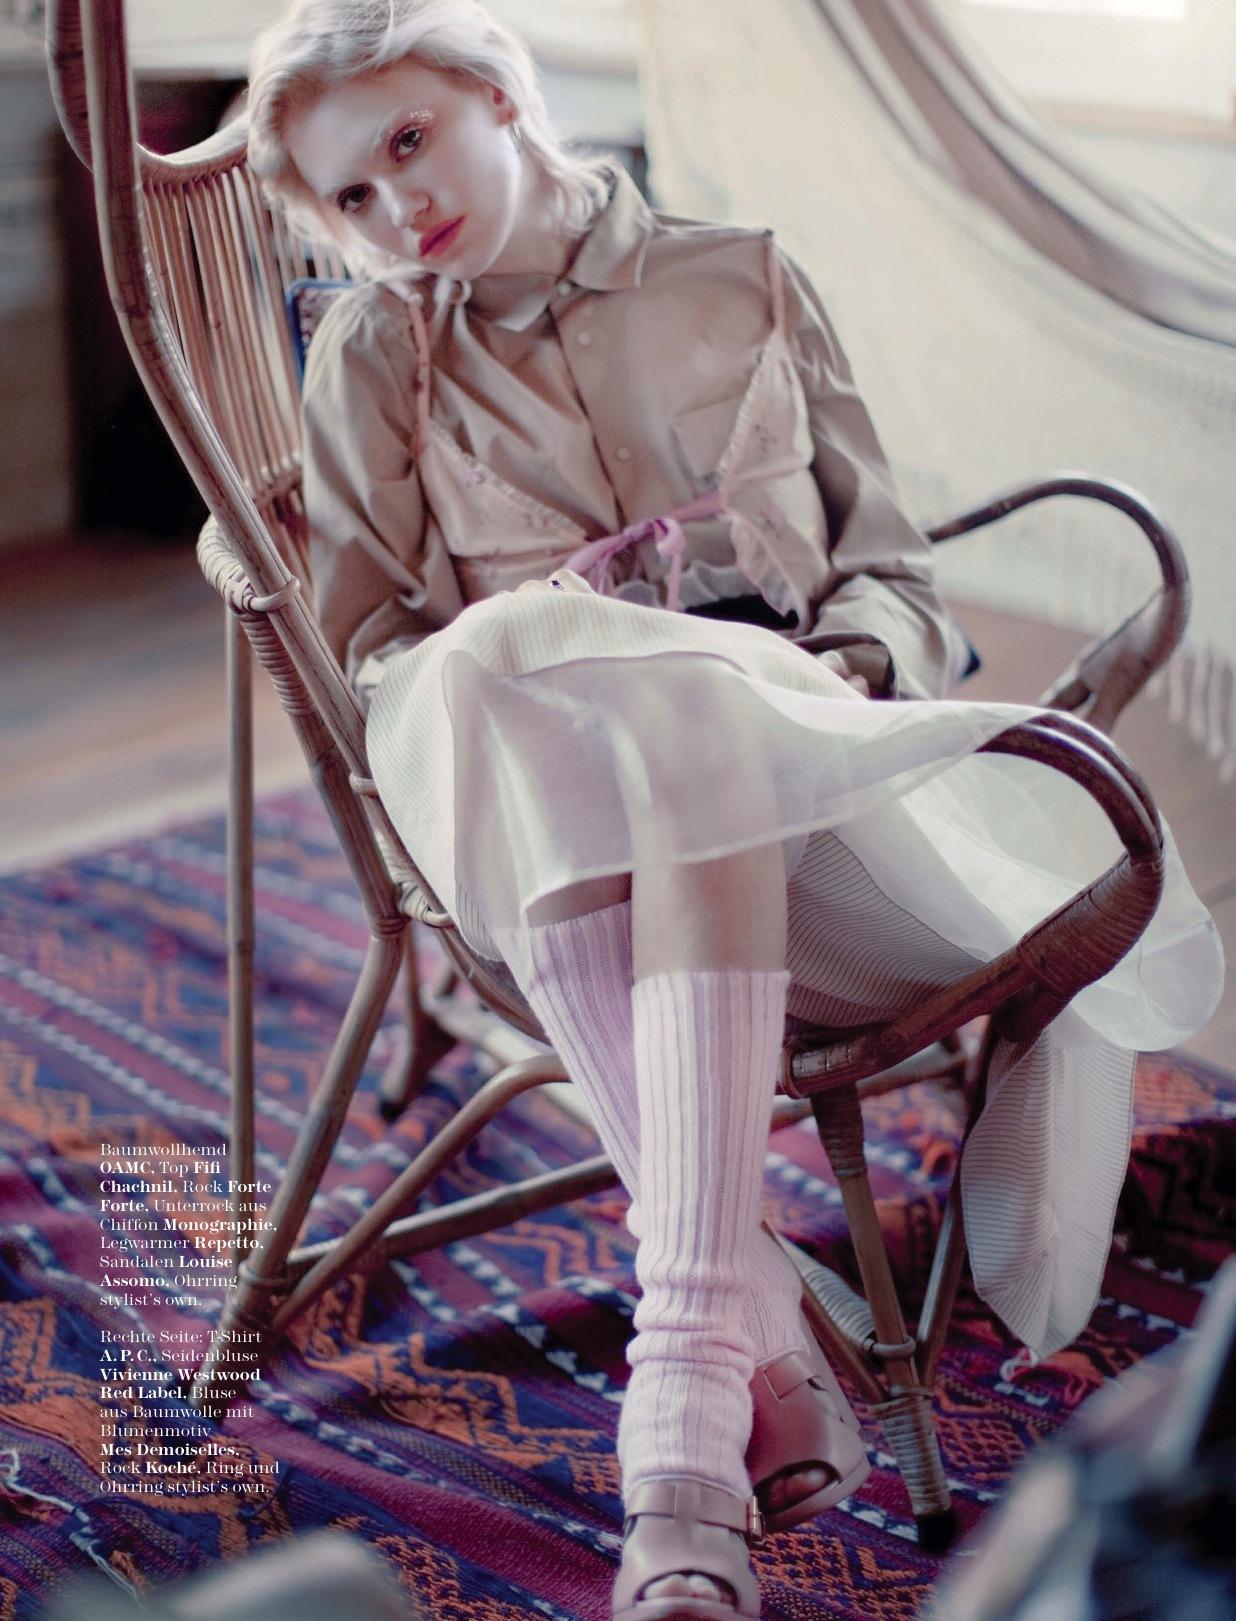 Cleavage Feet Sasha Melnychuk naked photo 2017